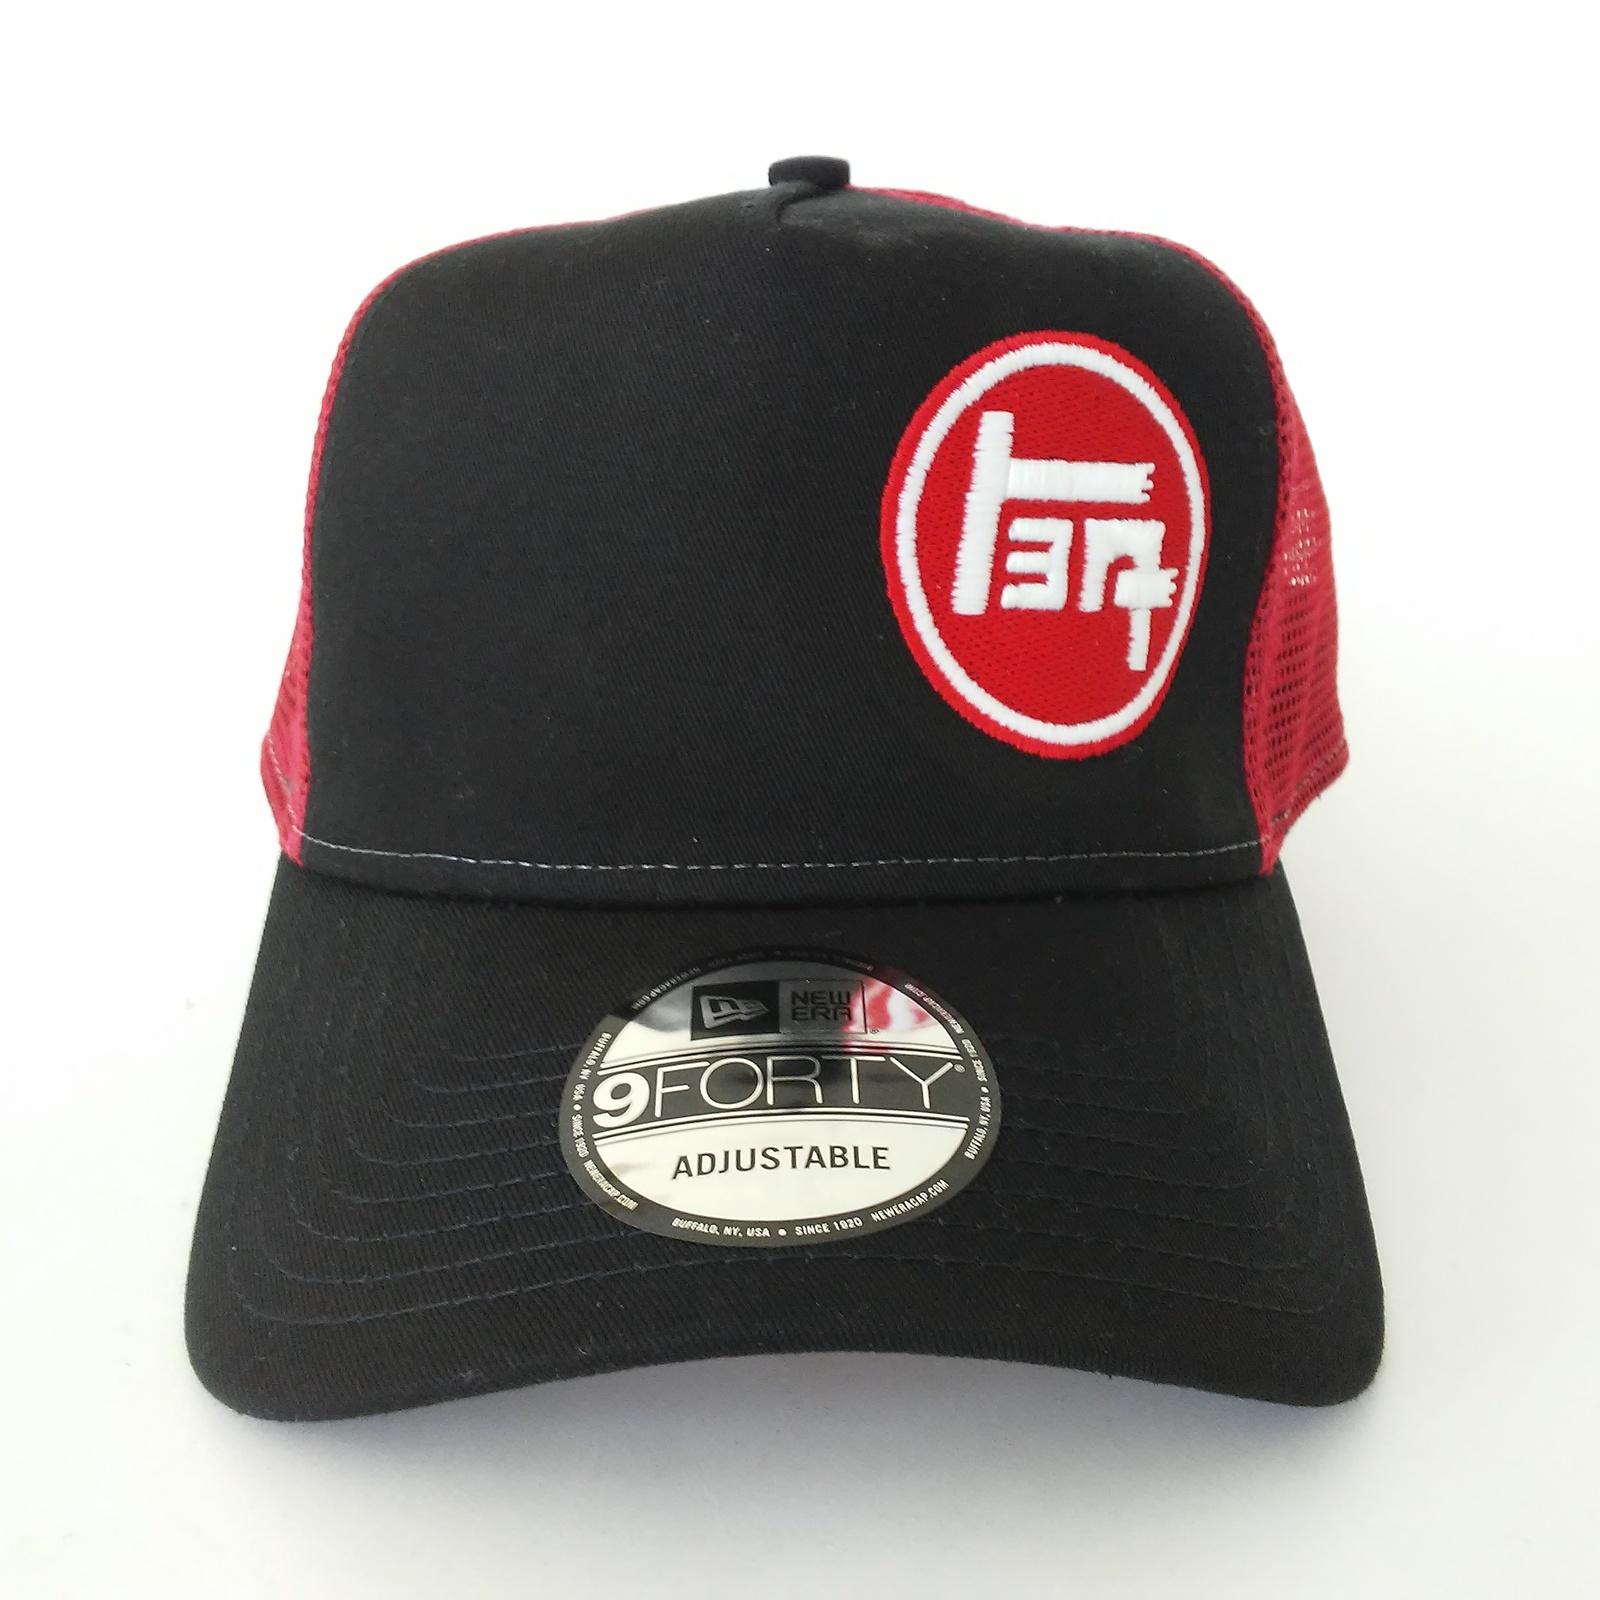 d18956711ce 20170404 142240. 20170404 142240. New Era 9forty TACOMA TEQ TOYOTA VINTAGE  BLACK RED TRUCKER HAT CAP SNAPBACK